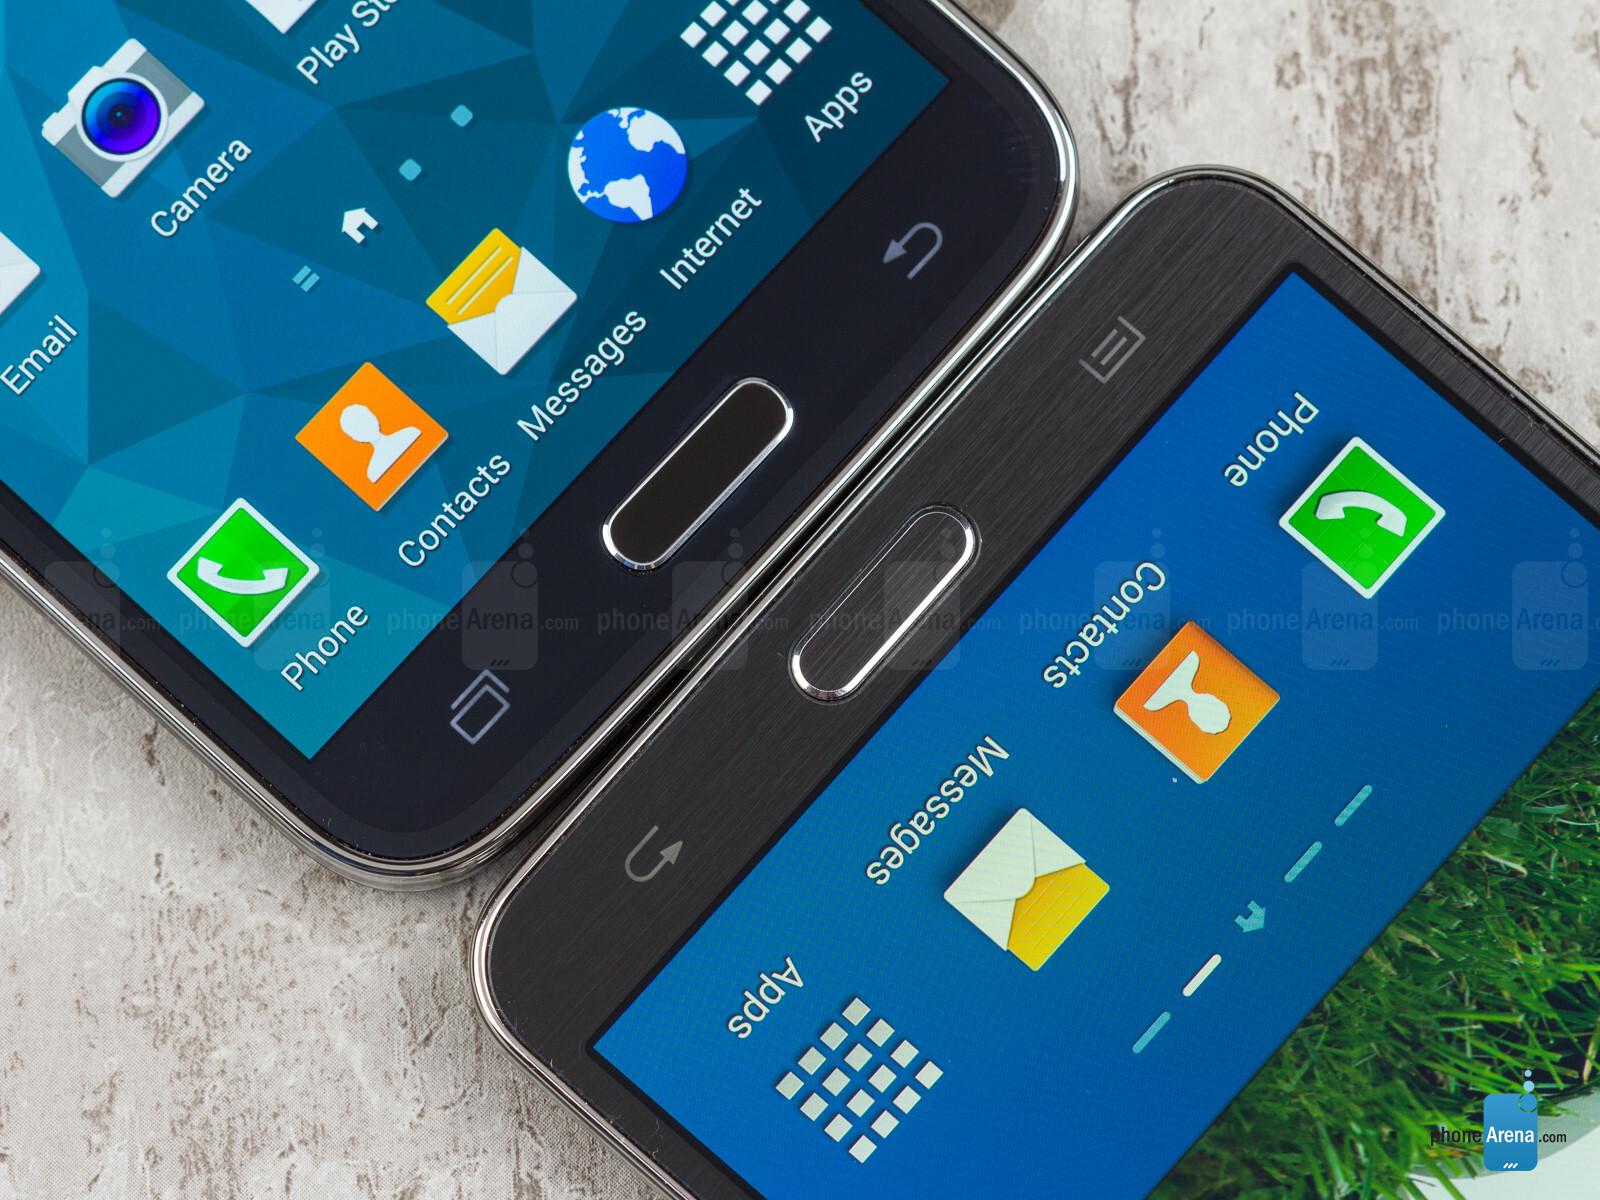 Photos for : Samsung Galaxy S5 vs Samsung Galaxy Note 3